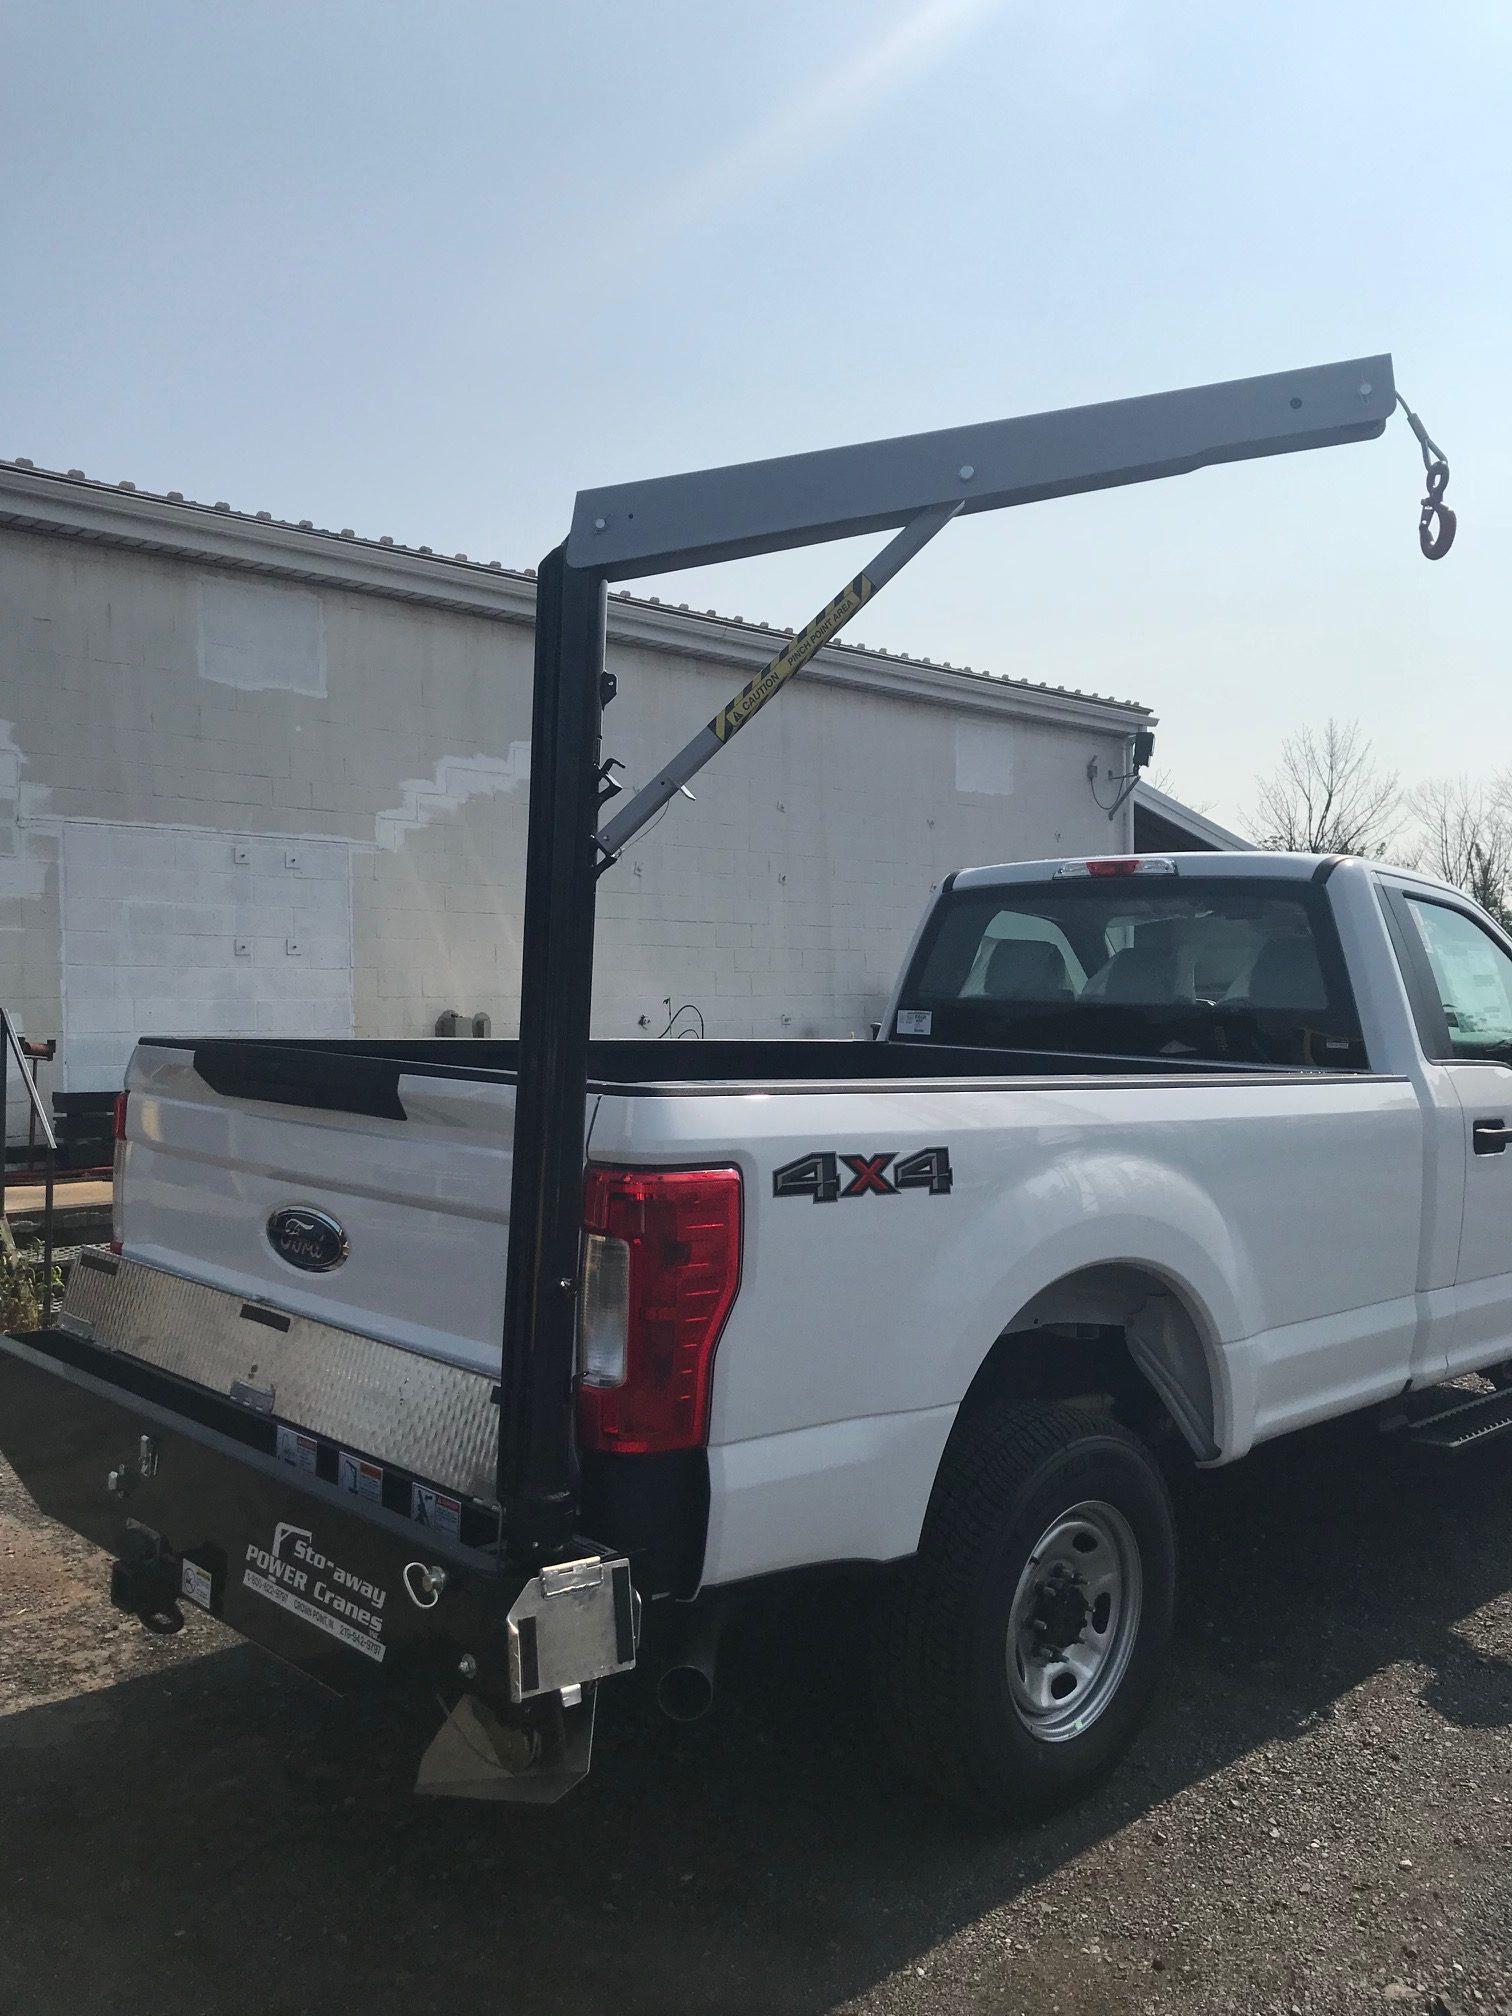 back of white pickup truck parked in gravel